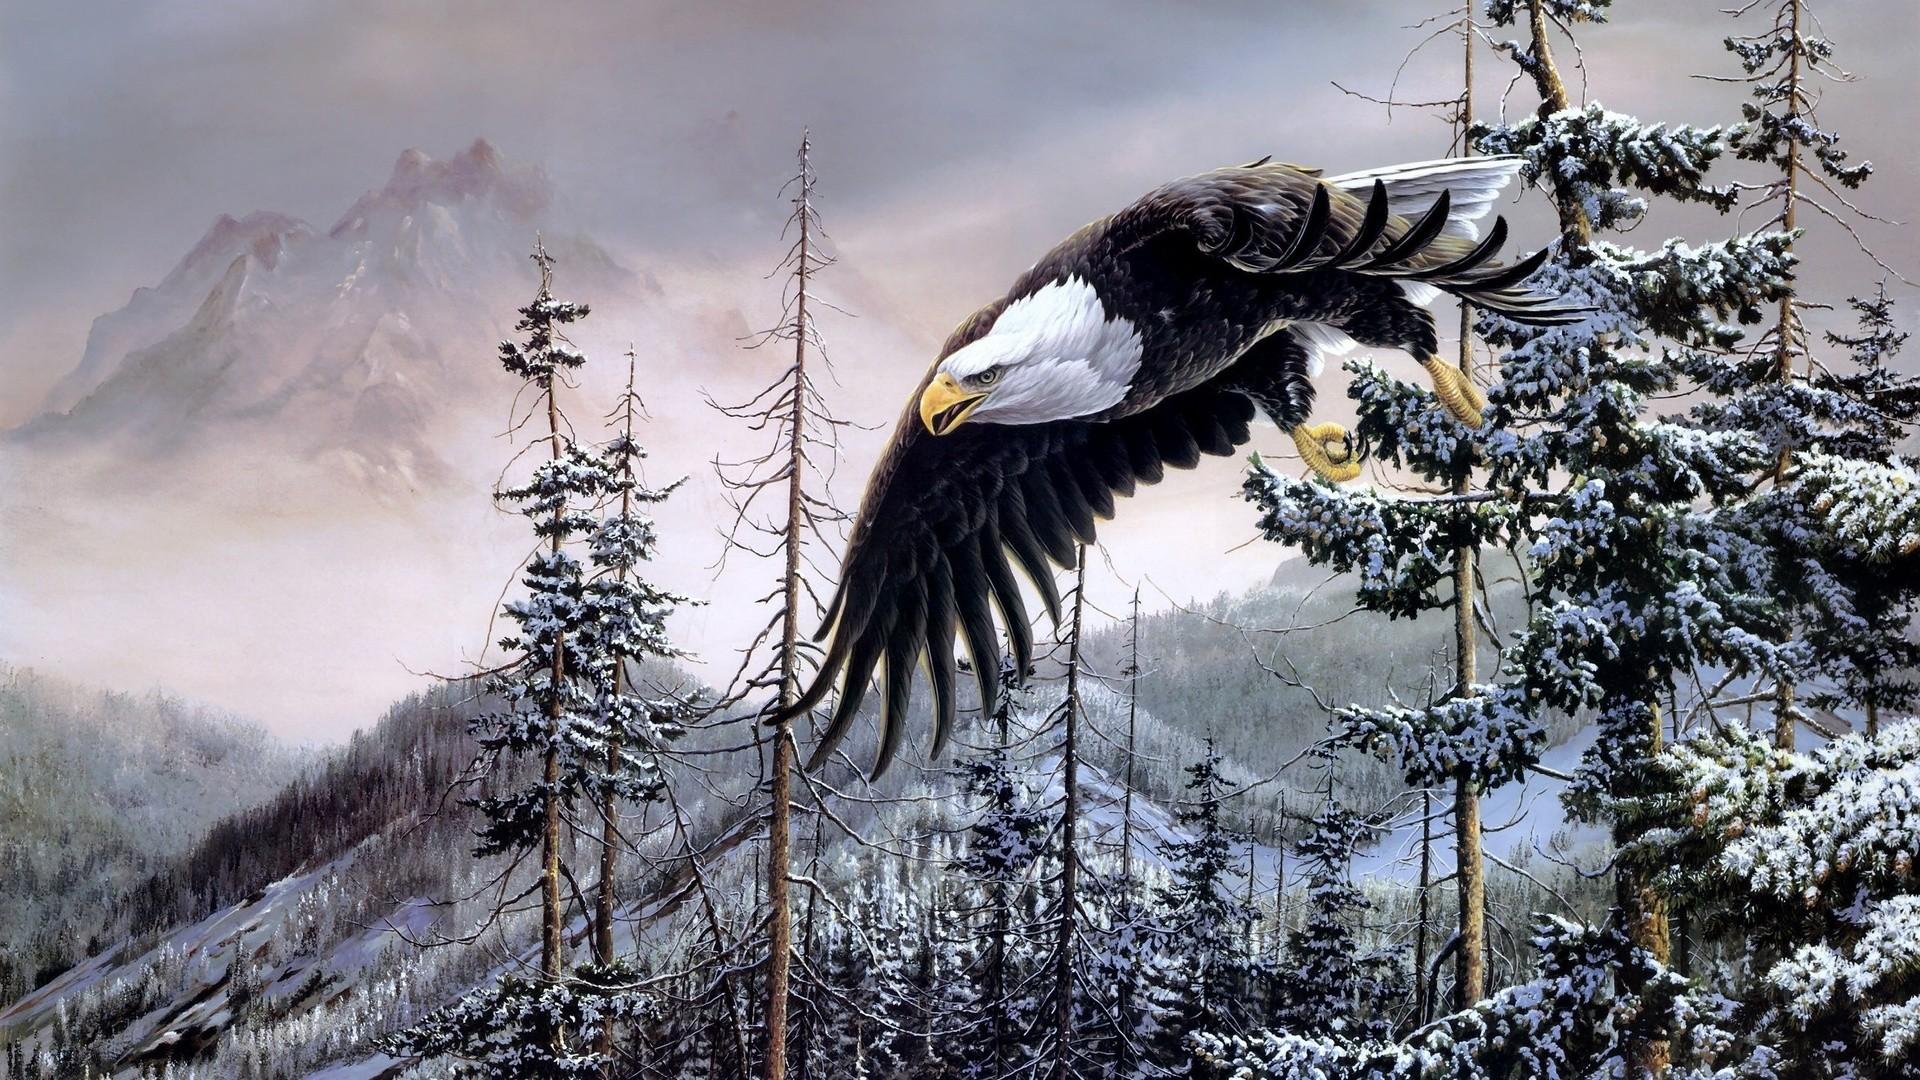 Iphone X Philadelphia Eagles Wallpaper Eagle Wallpaper 81 Images